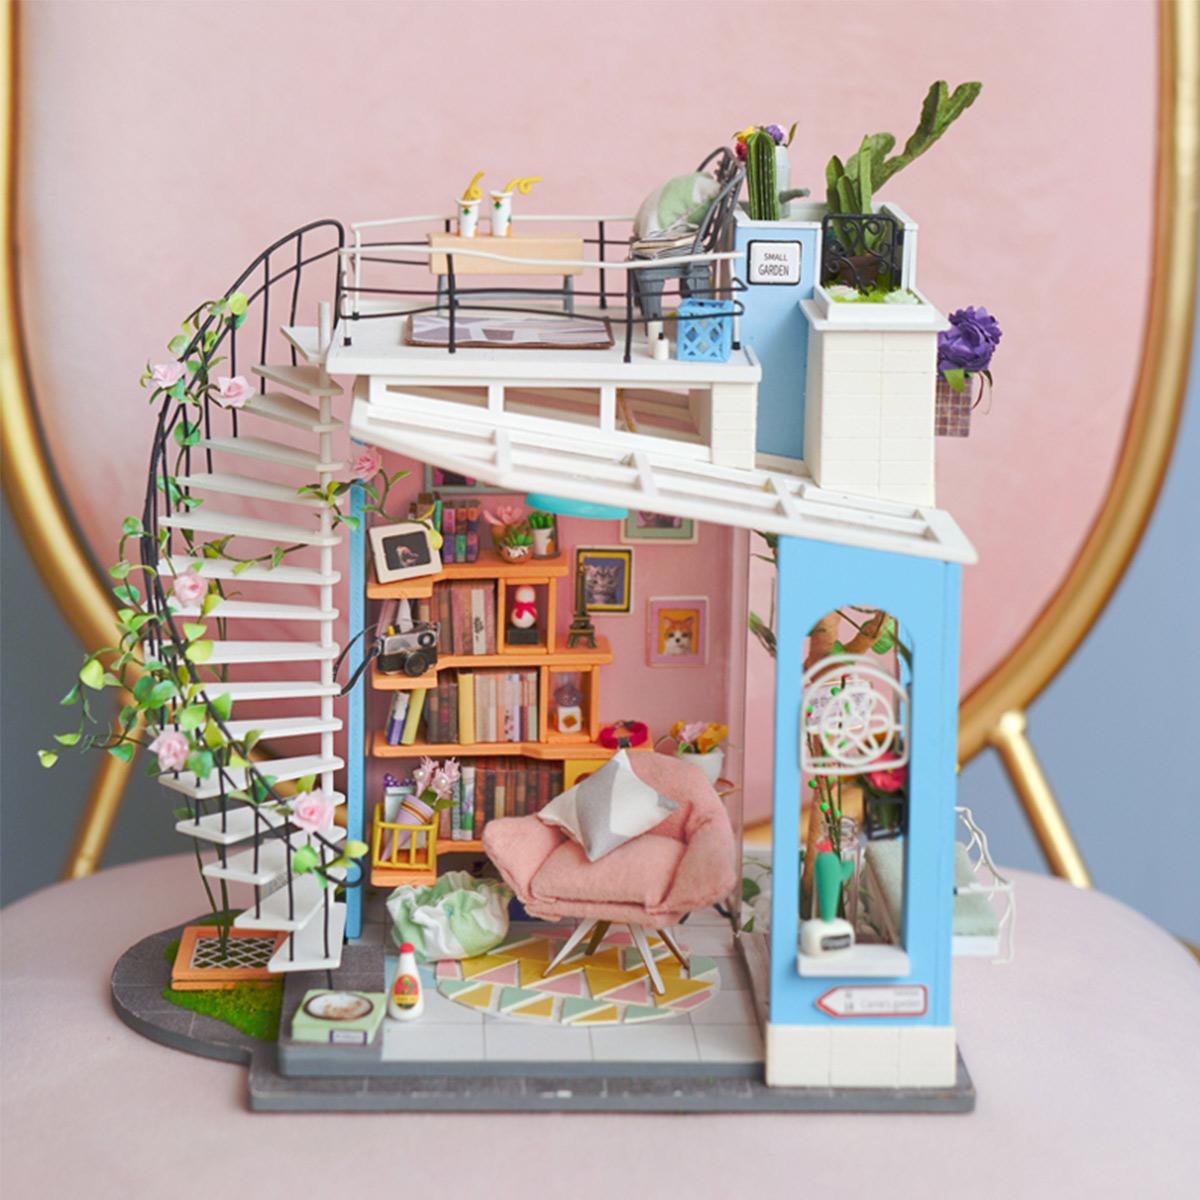 Dora's Loft DG12